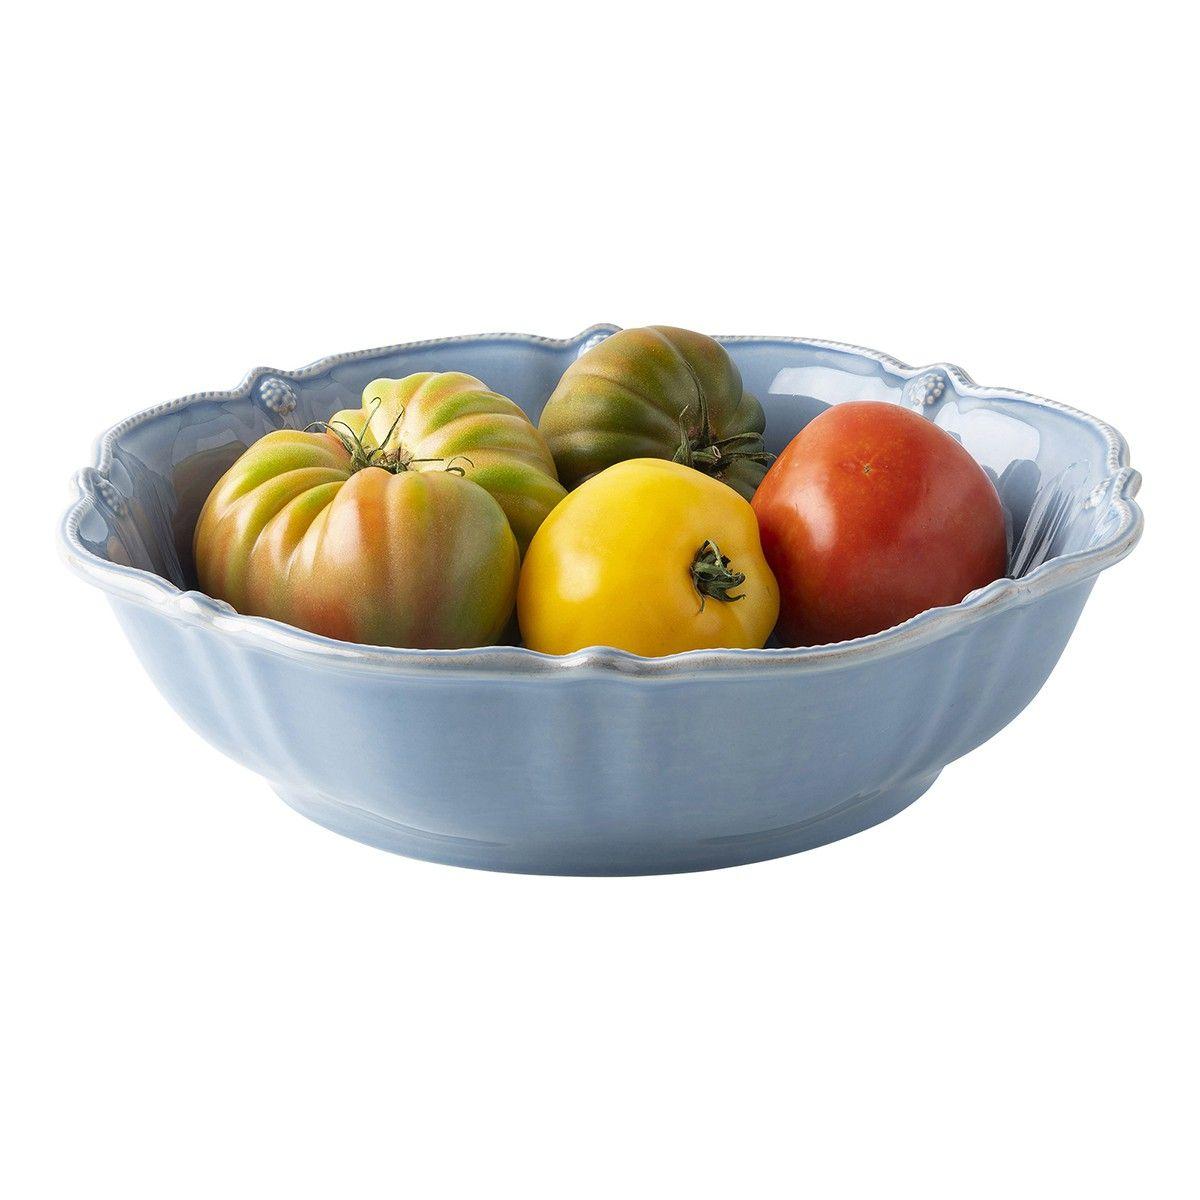 Juliska Berry & Thread Chambray 13 Bowl #casualdinnerware